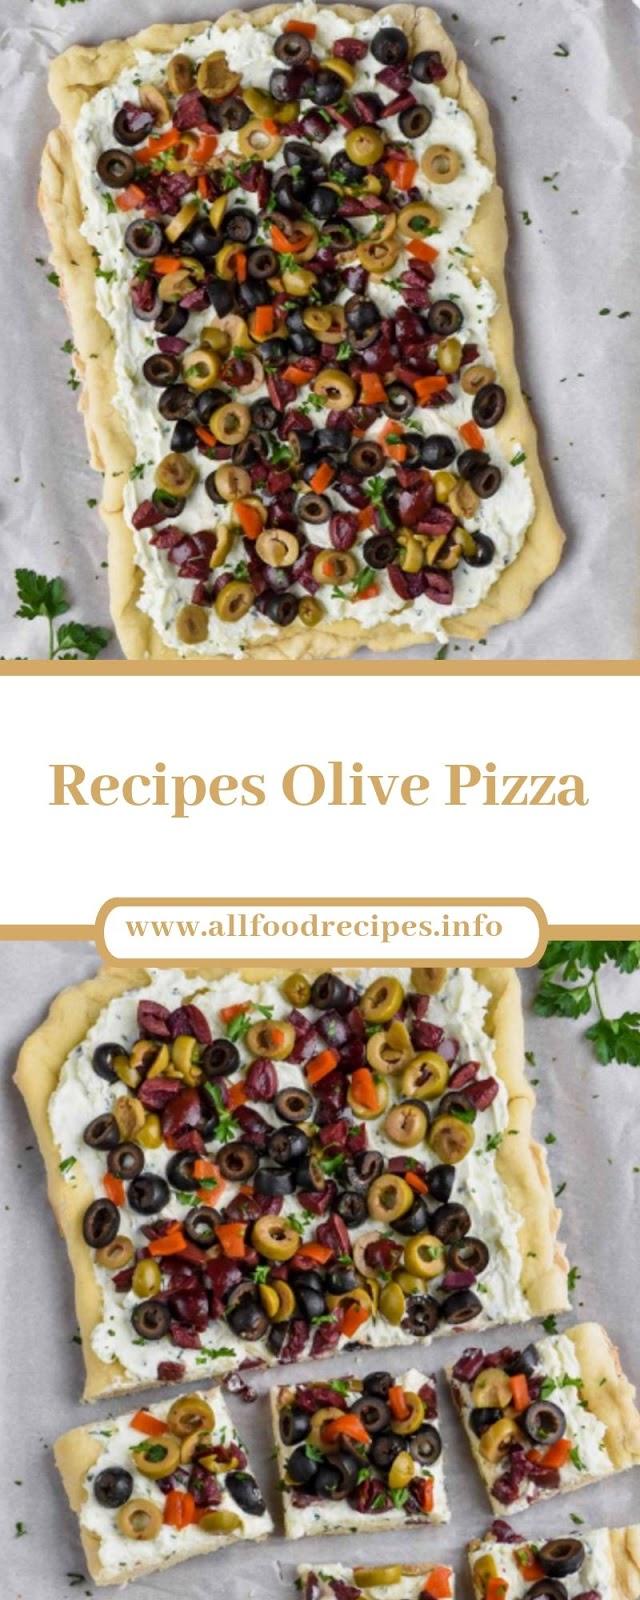 Recipes Olive Pizza